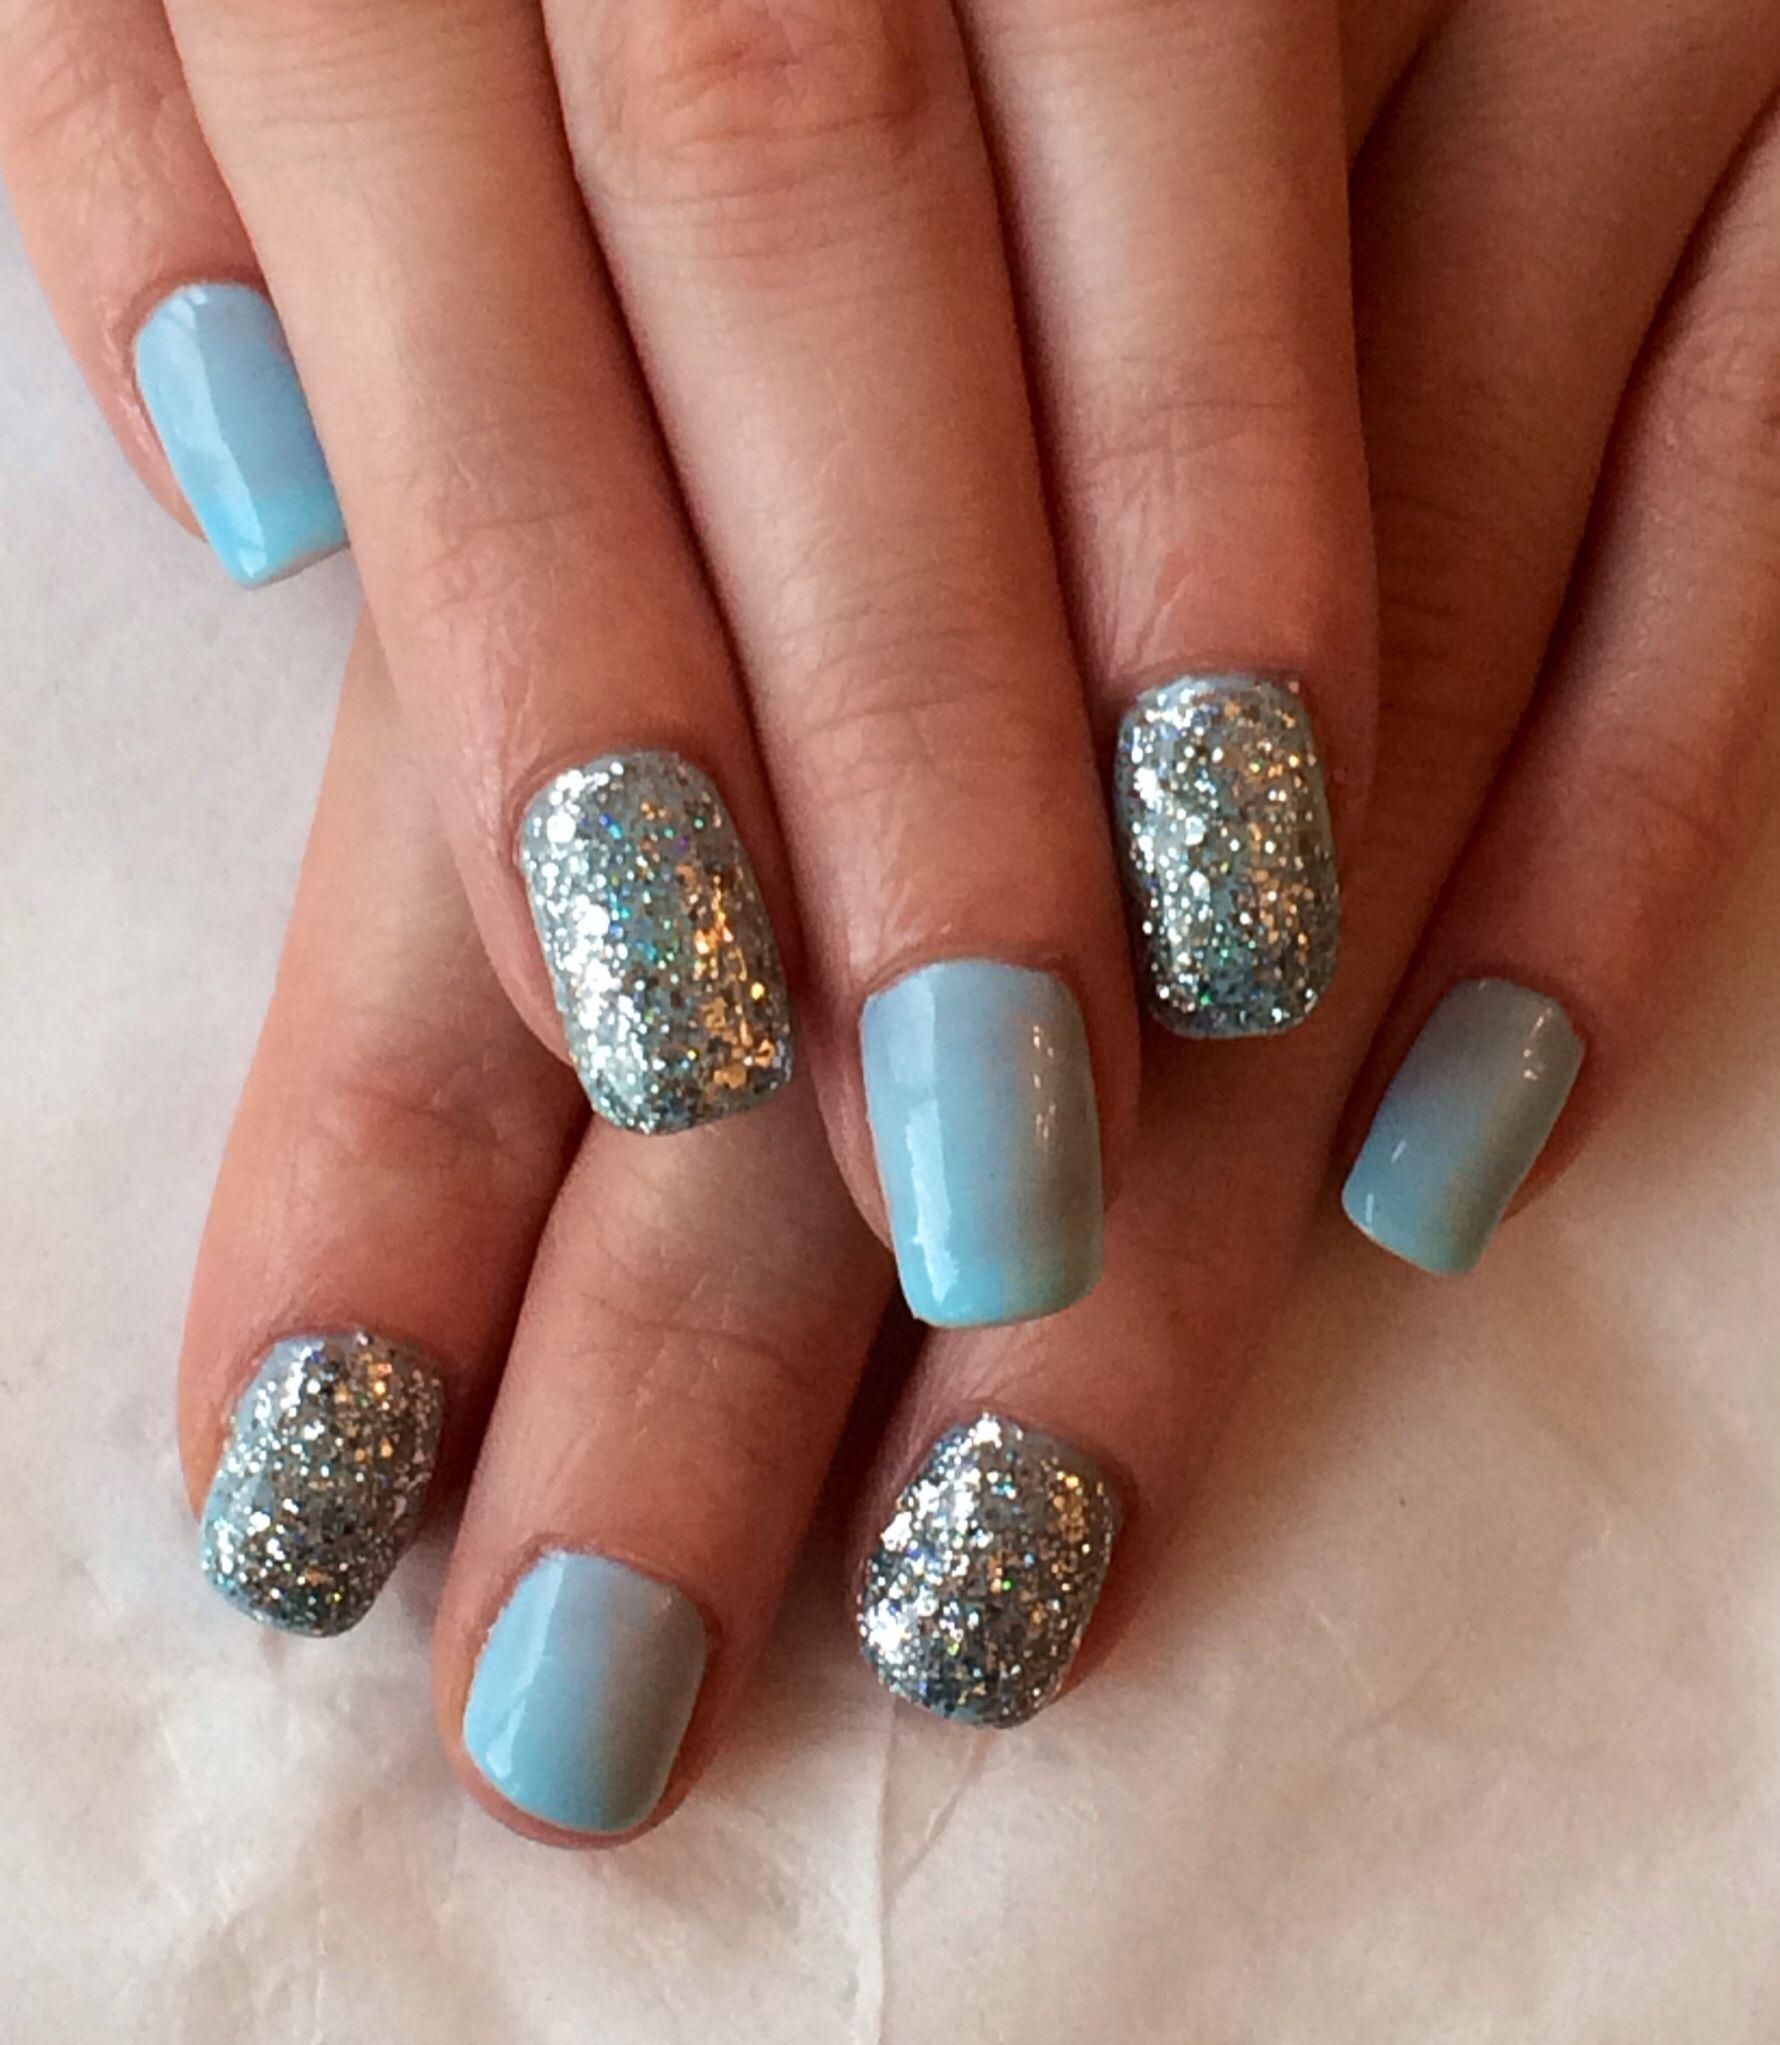 Cinderella Inspired Nail Art: Cinderella Inspired Nails #gelish #myonebluelove